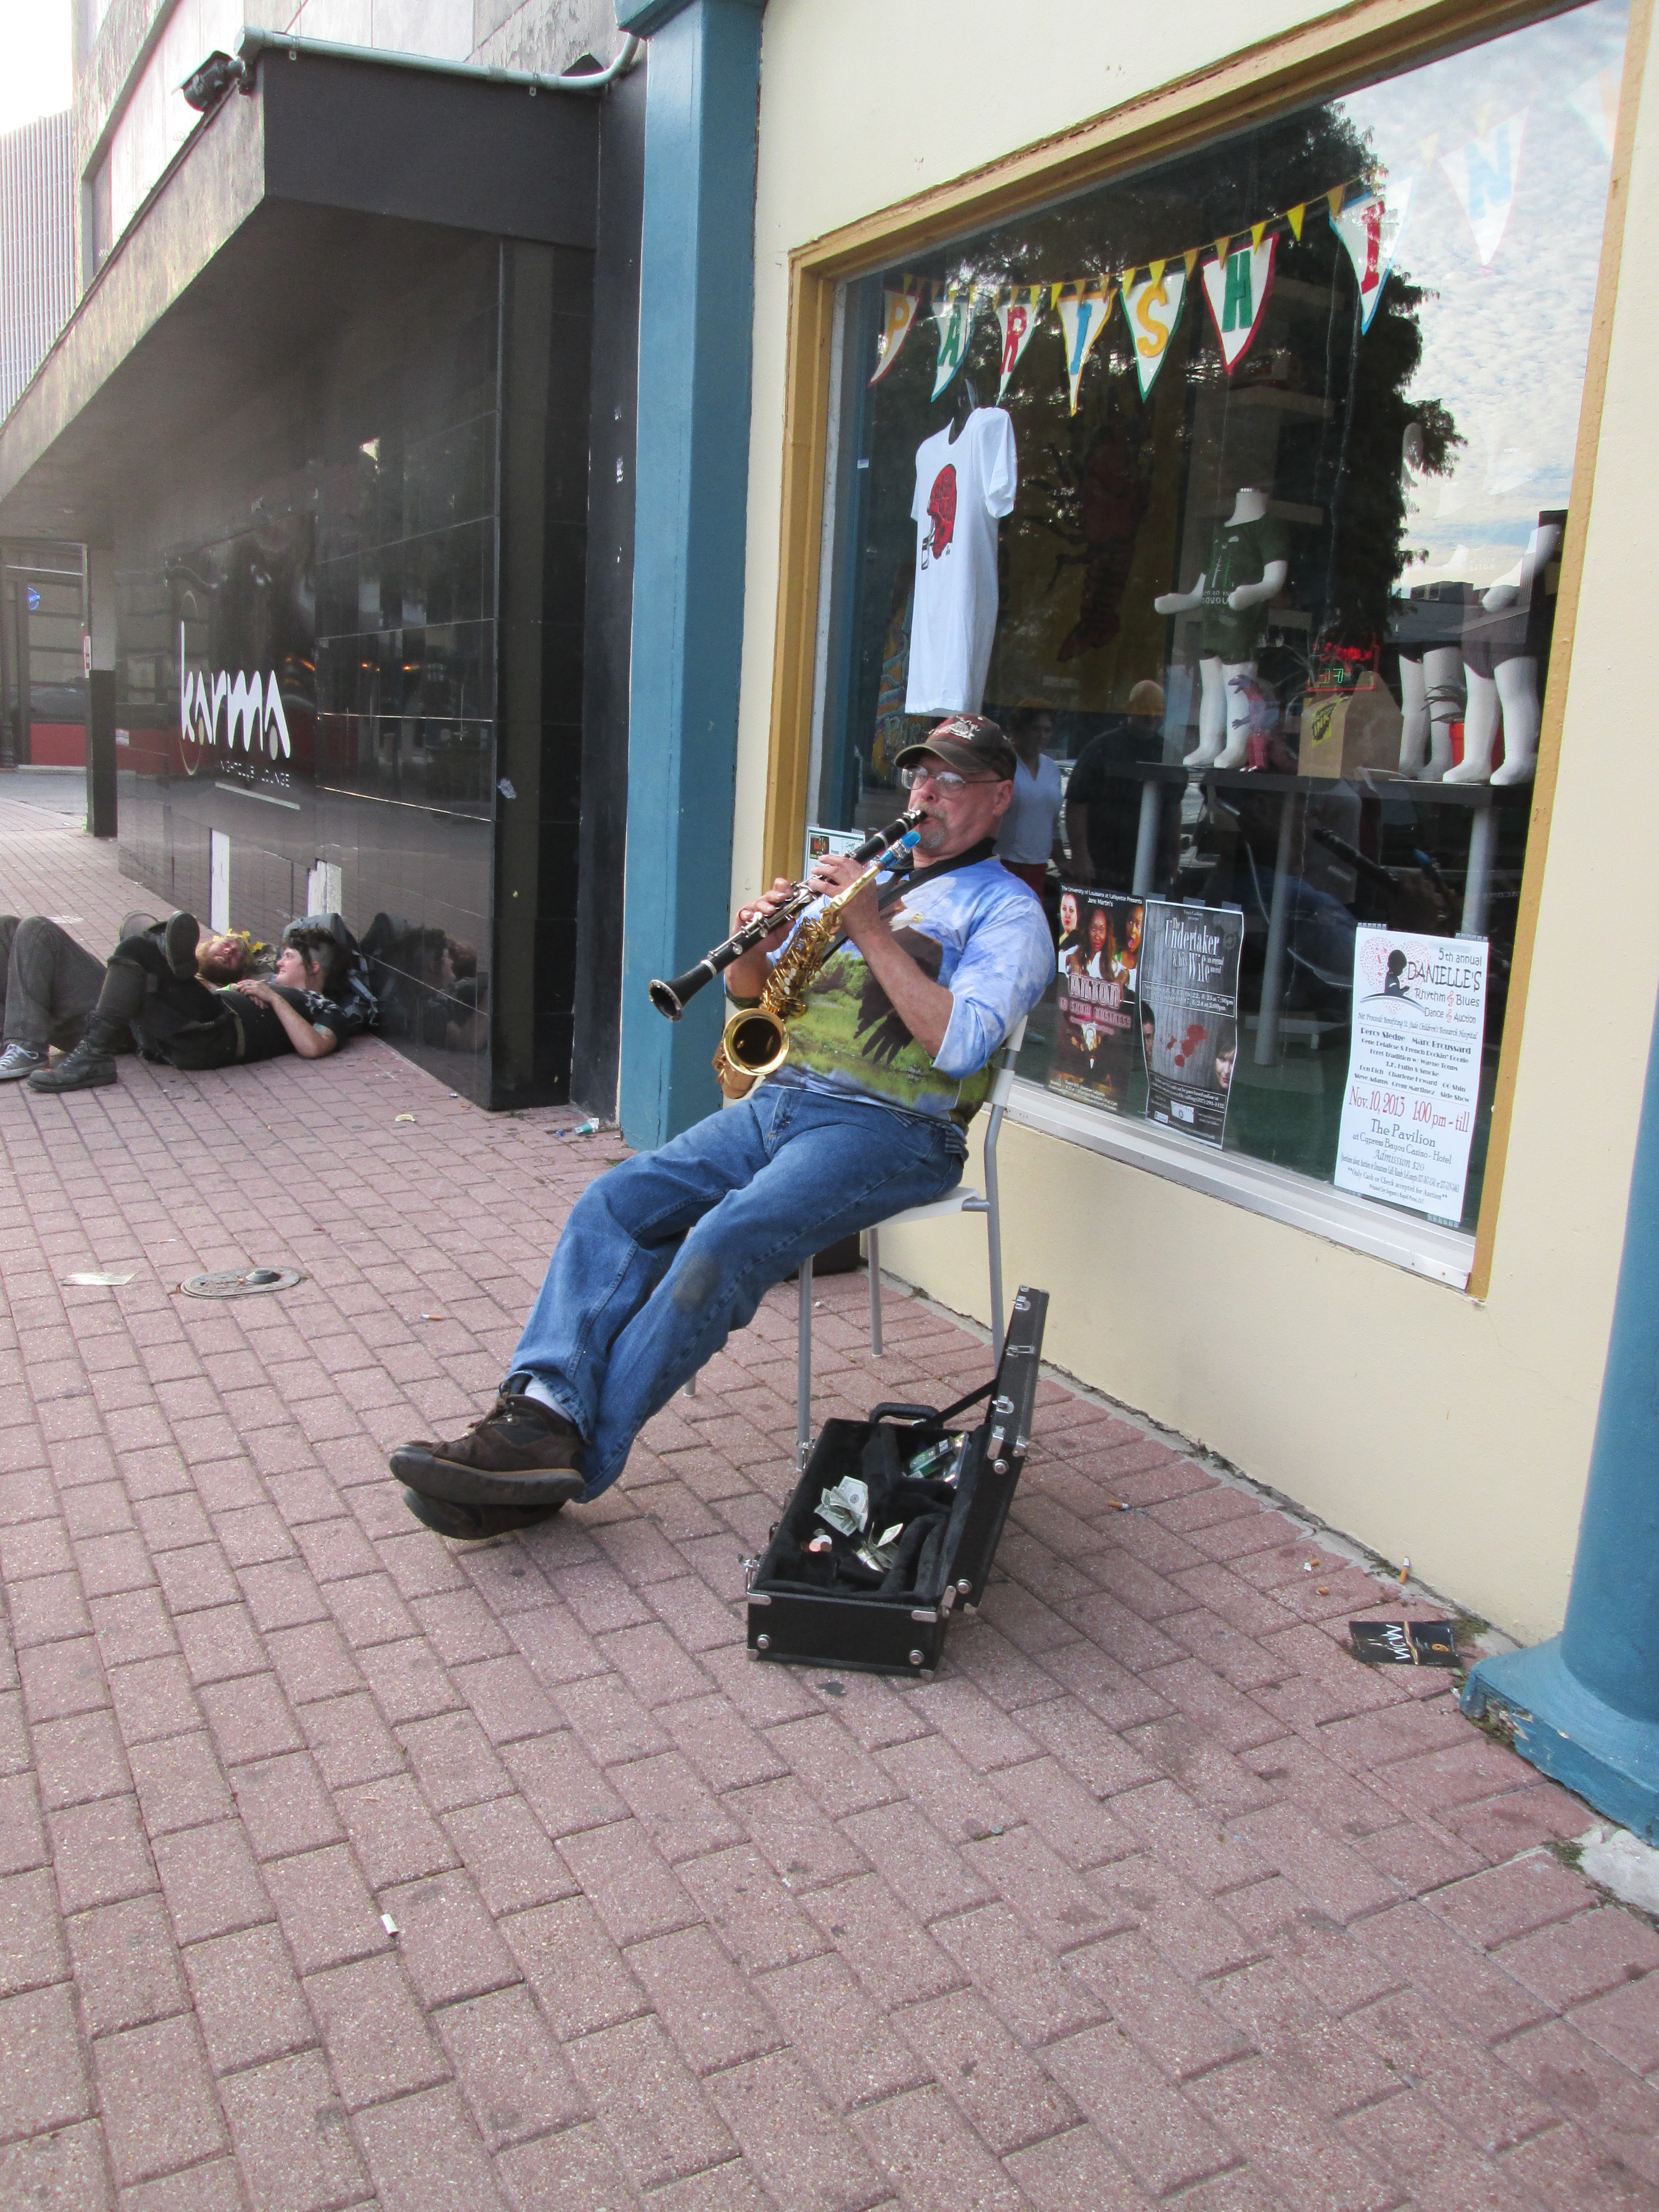 File:Lafayette LA Nov2013 Jefferson St Fun Clarinet JPG - Wikimedia